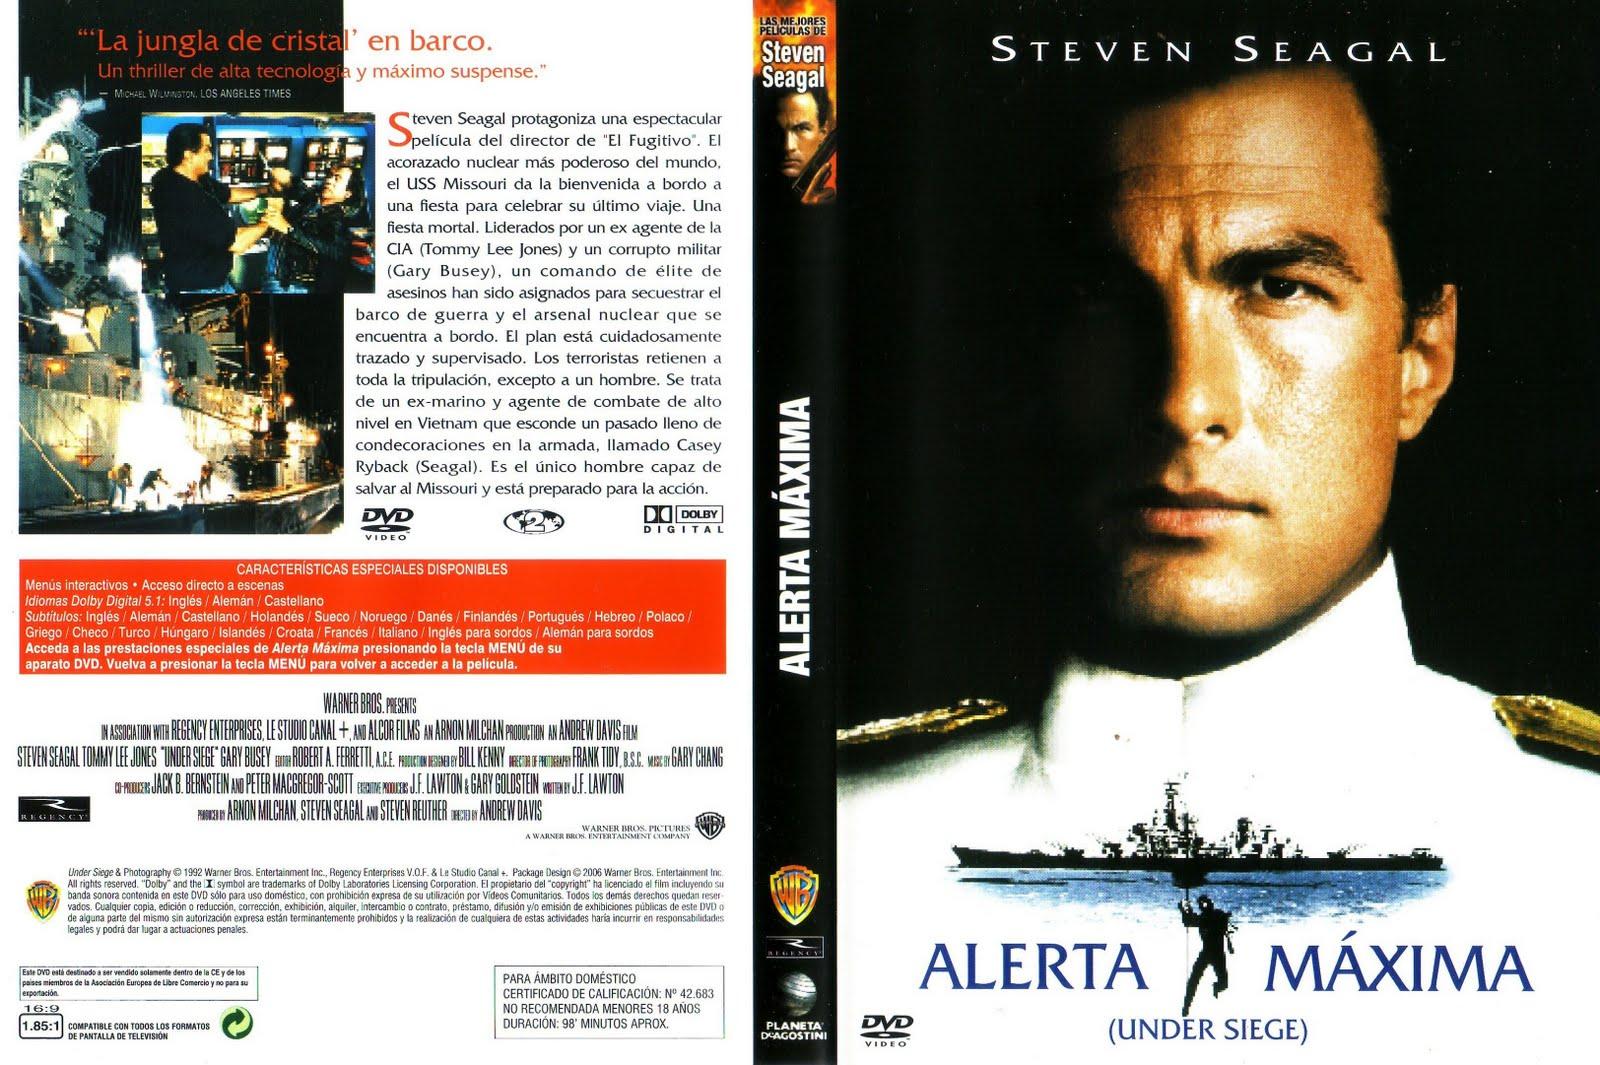 Alerta Máxima 1 (1992) [Dvdrip Latino] [Zippyshare]